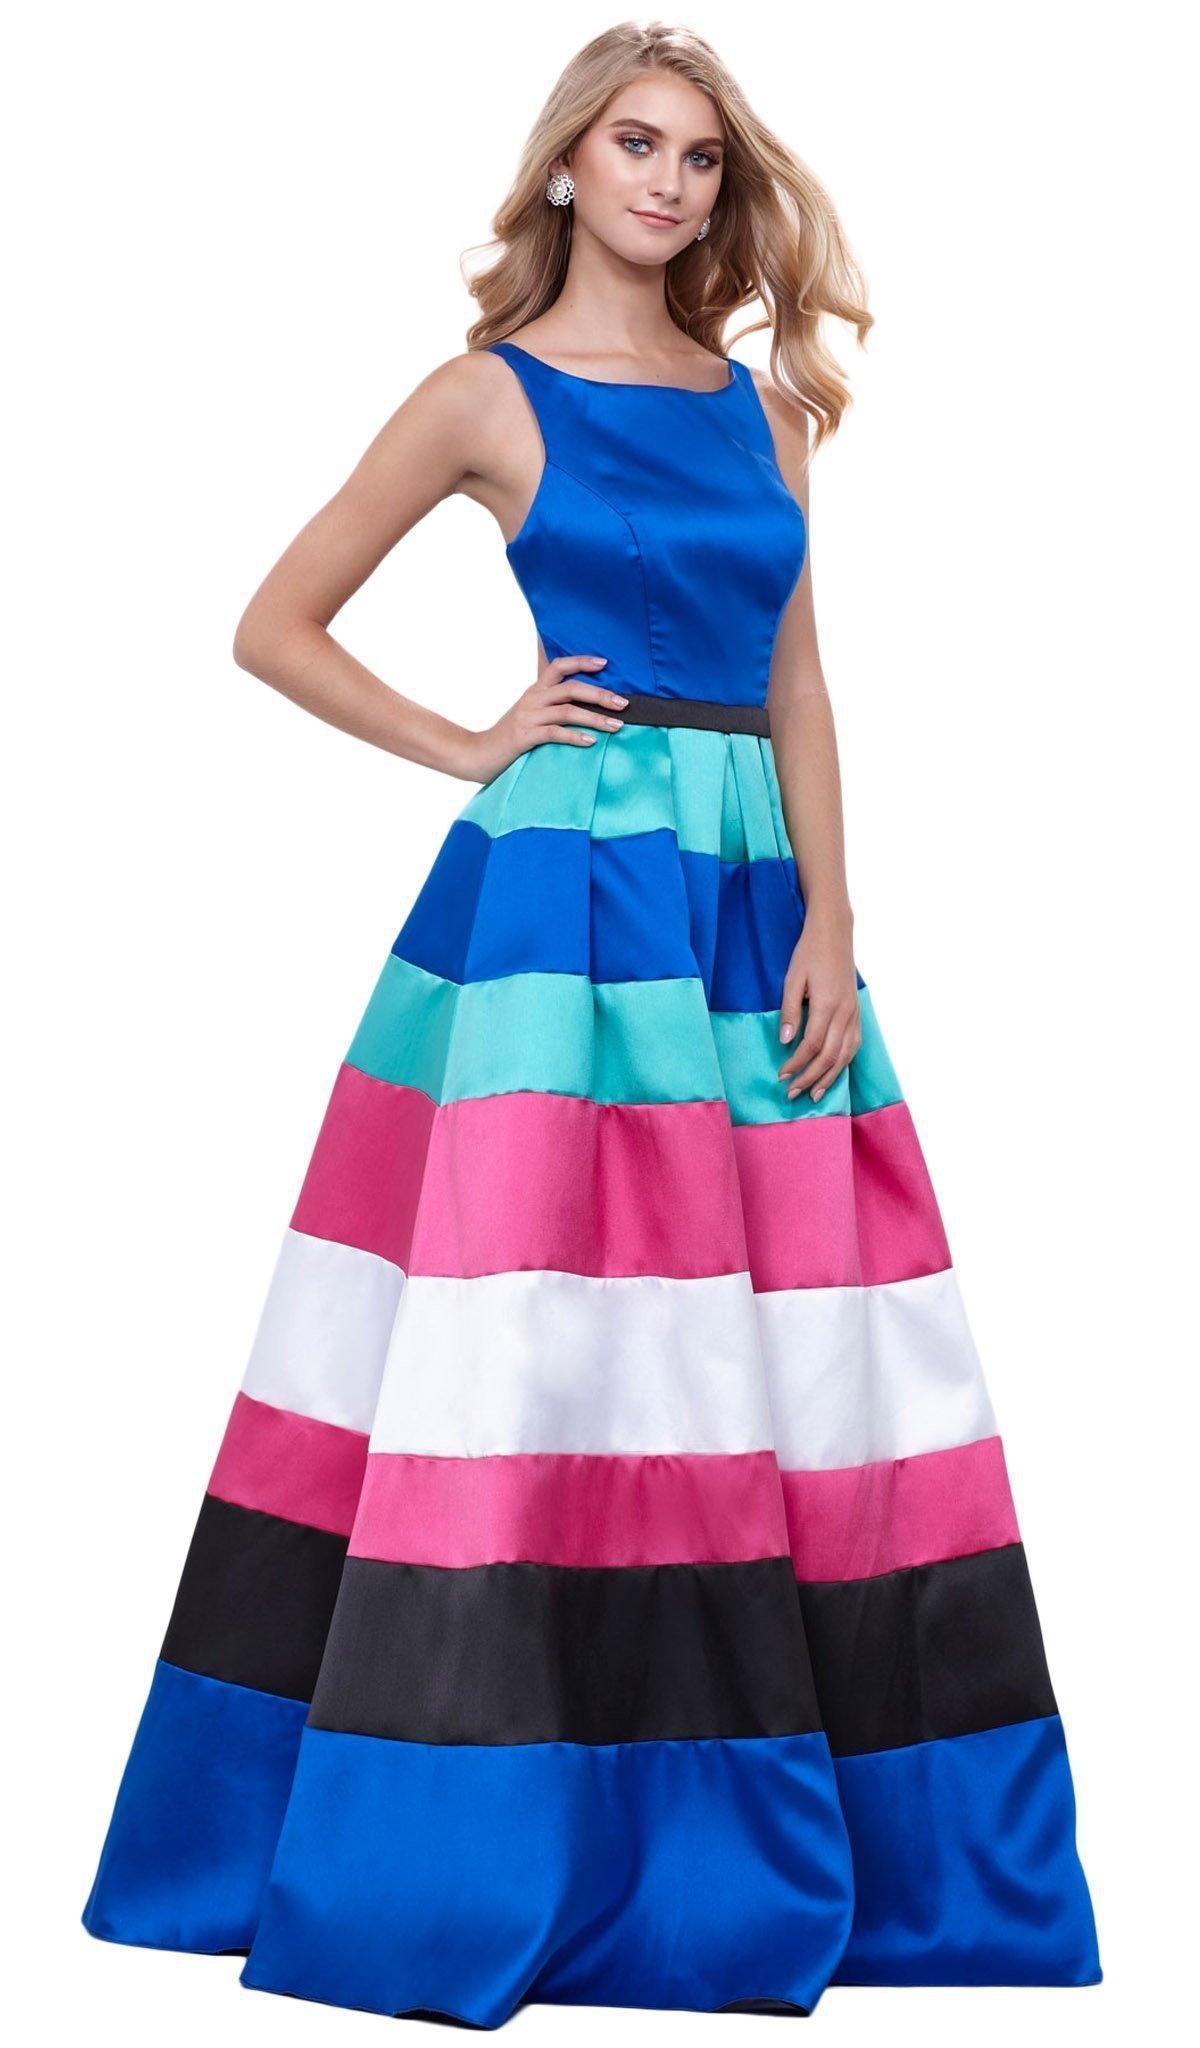 Nox Anabel - 8350 Long Sleeveless Mikado Evening Dress